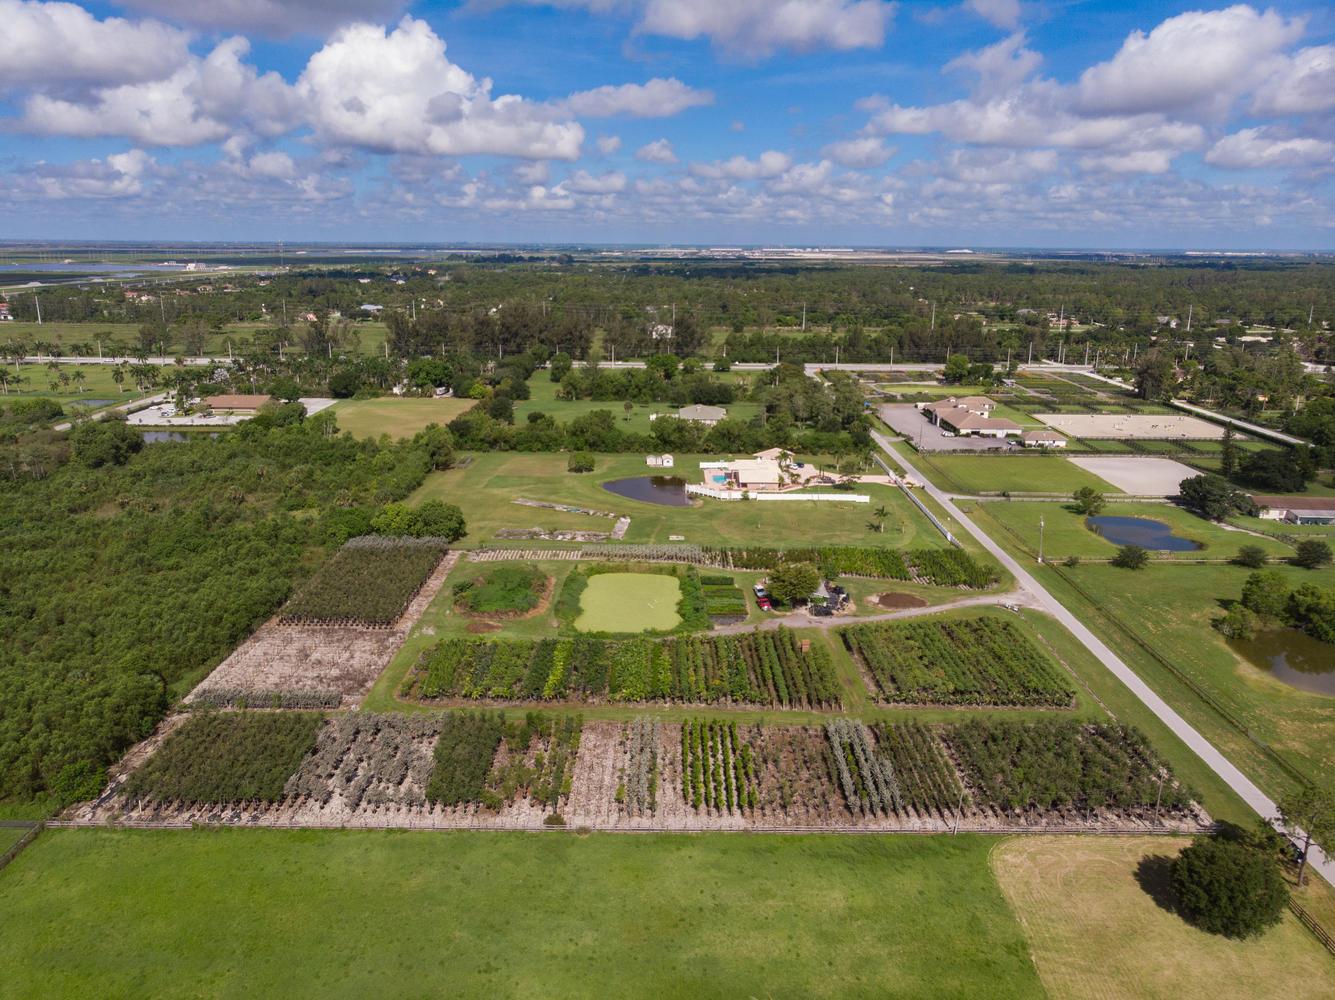 16424 Van Gogh Road, Loxahatchee, Florida 33470, ,Single Family,For Sale,Van Gogh,RX-10575947